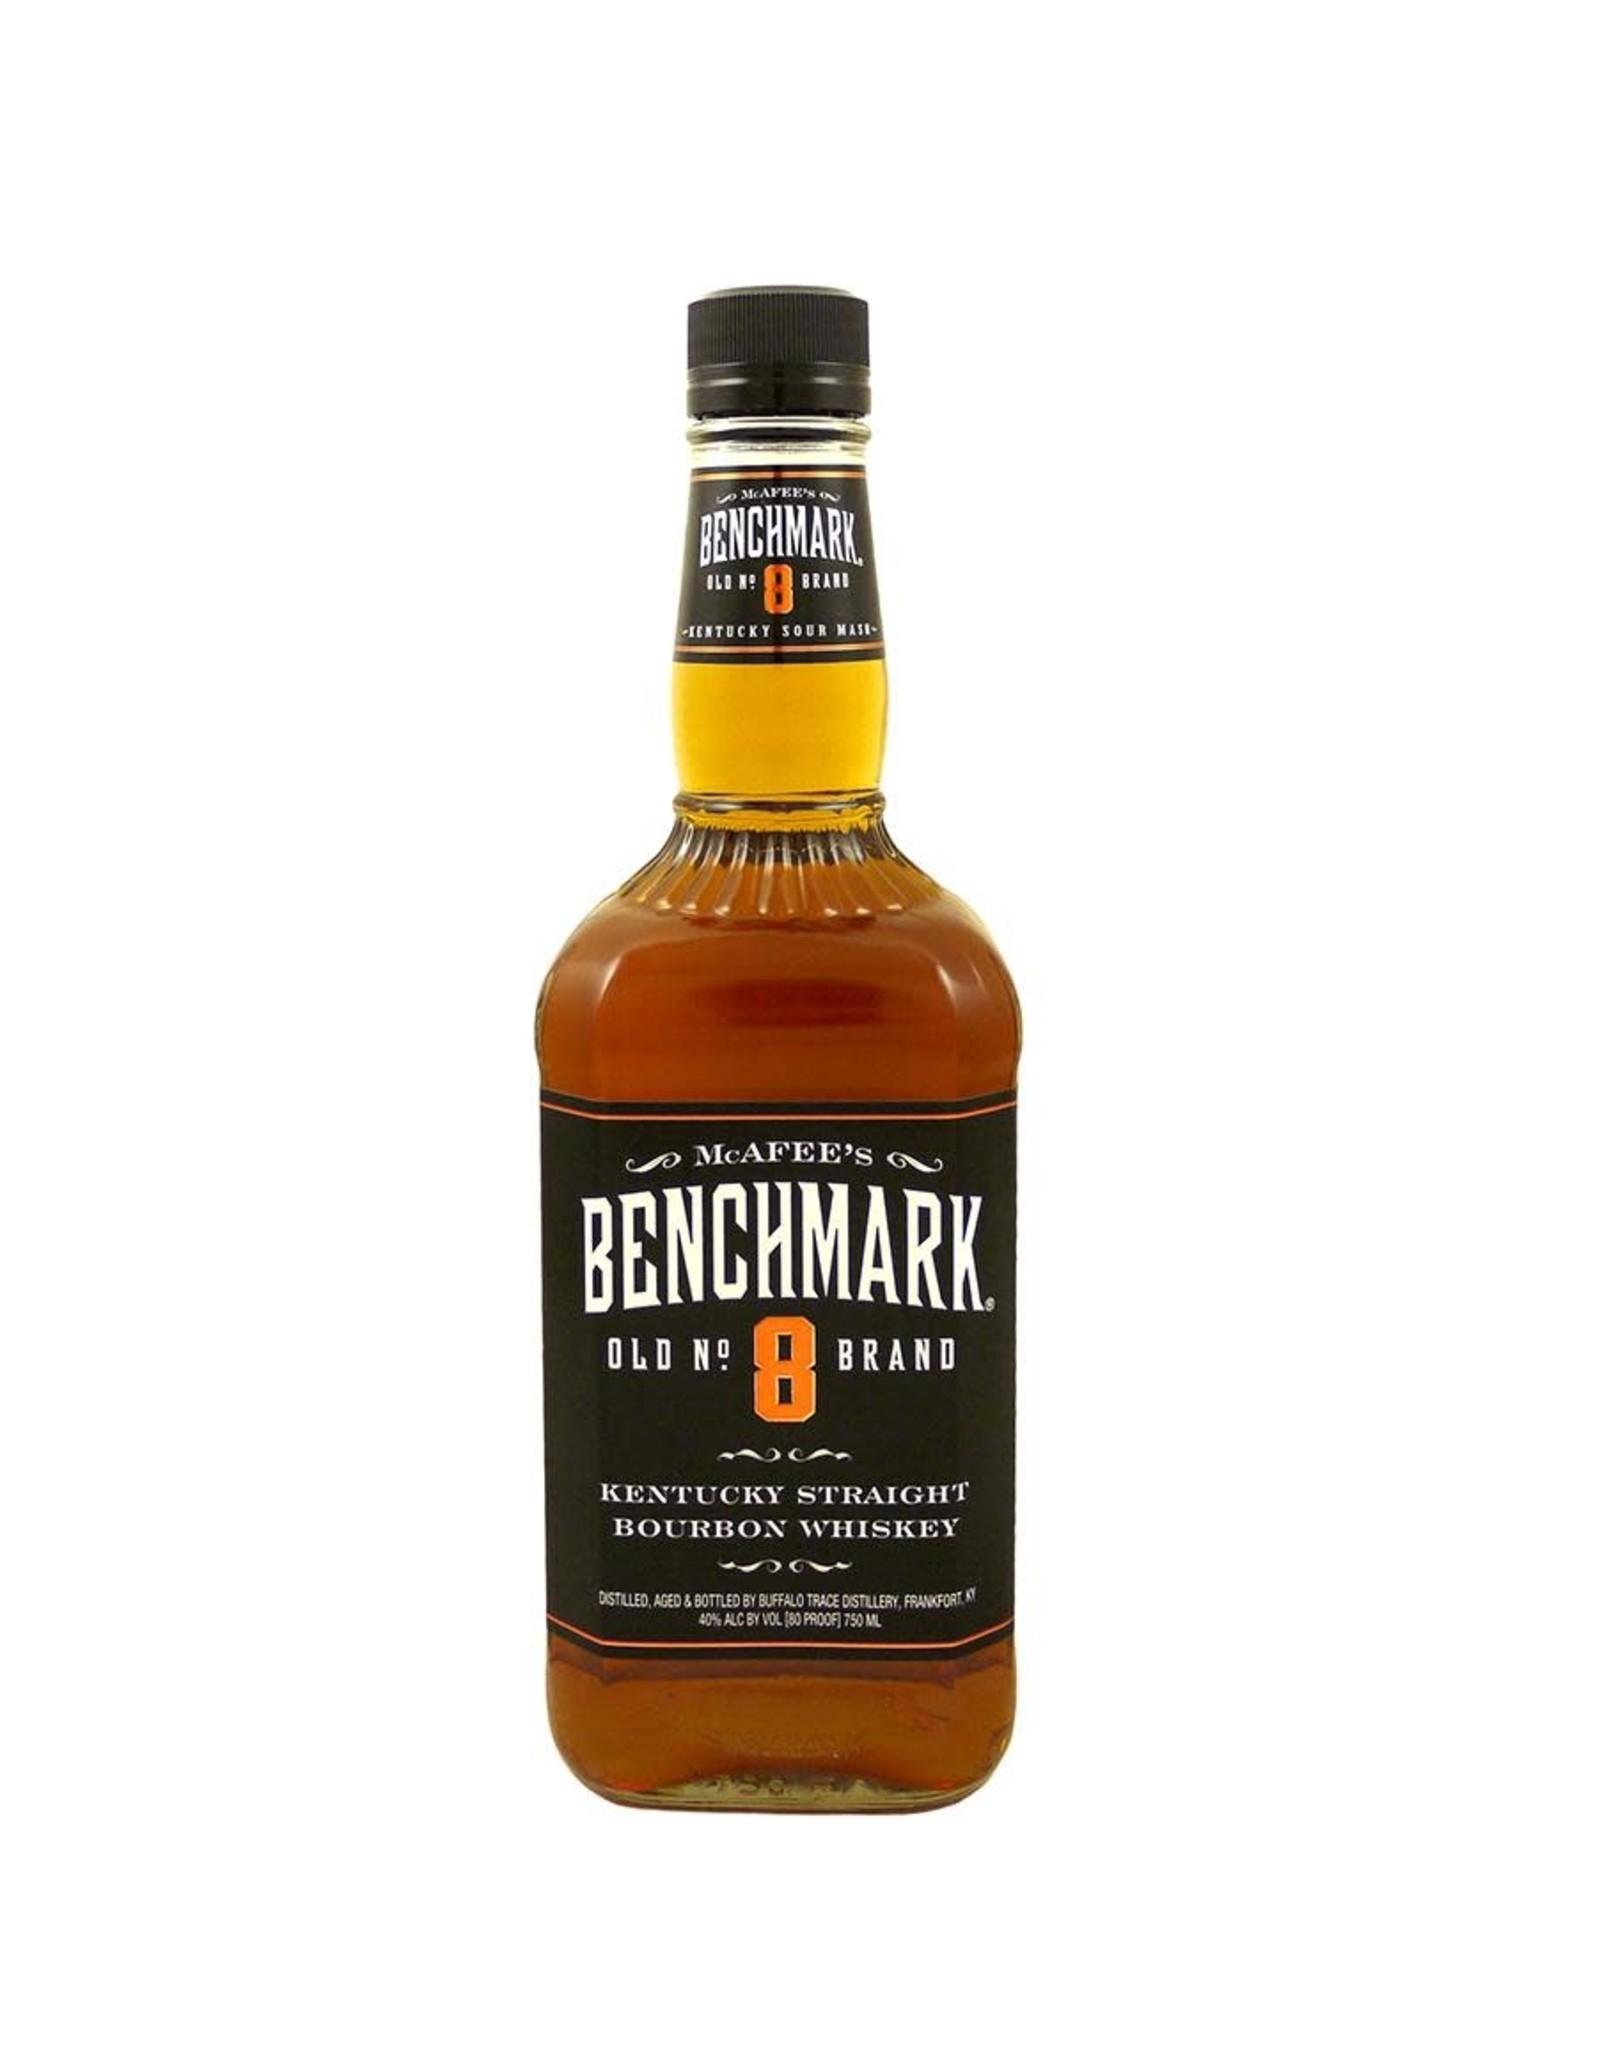 BENCHMARK OLD NO 8 BRAND 750ML